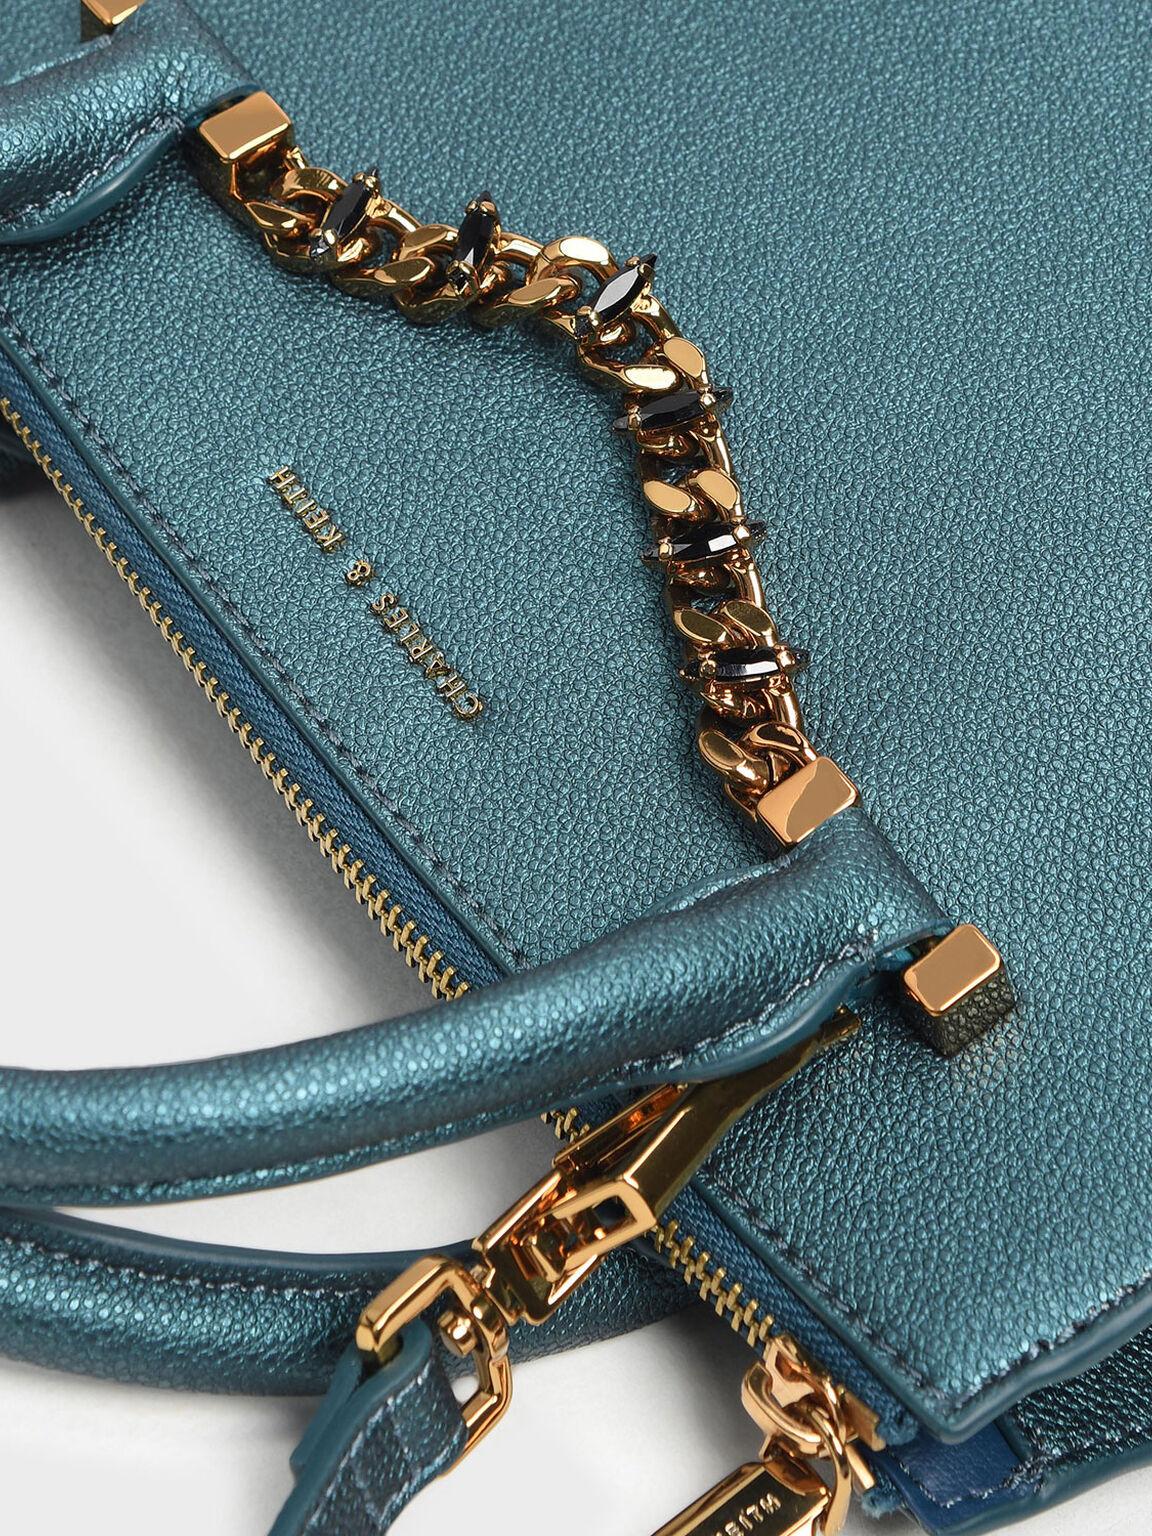 Chain Detail Handbag, Teal, hi-res